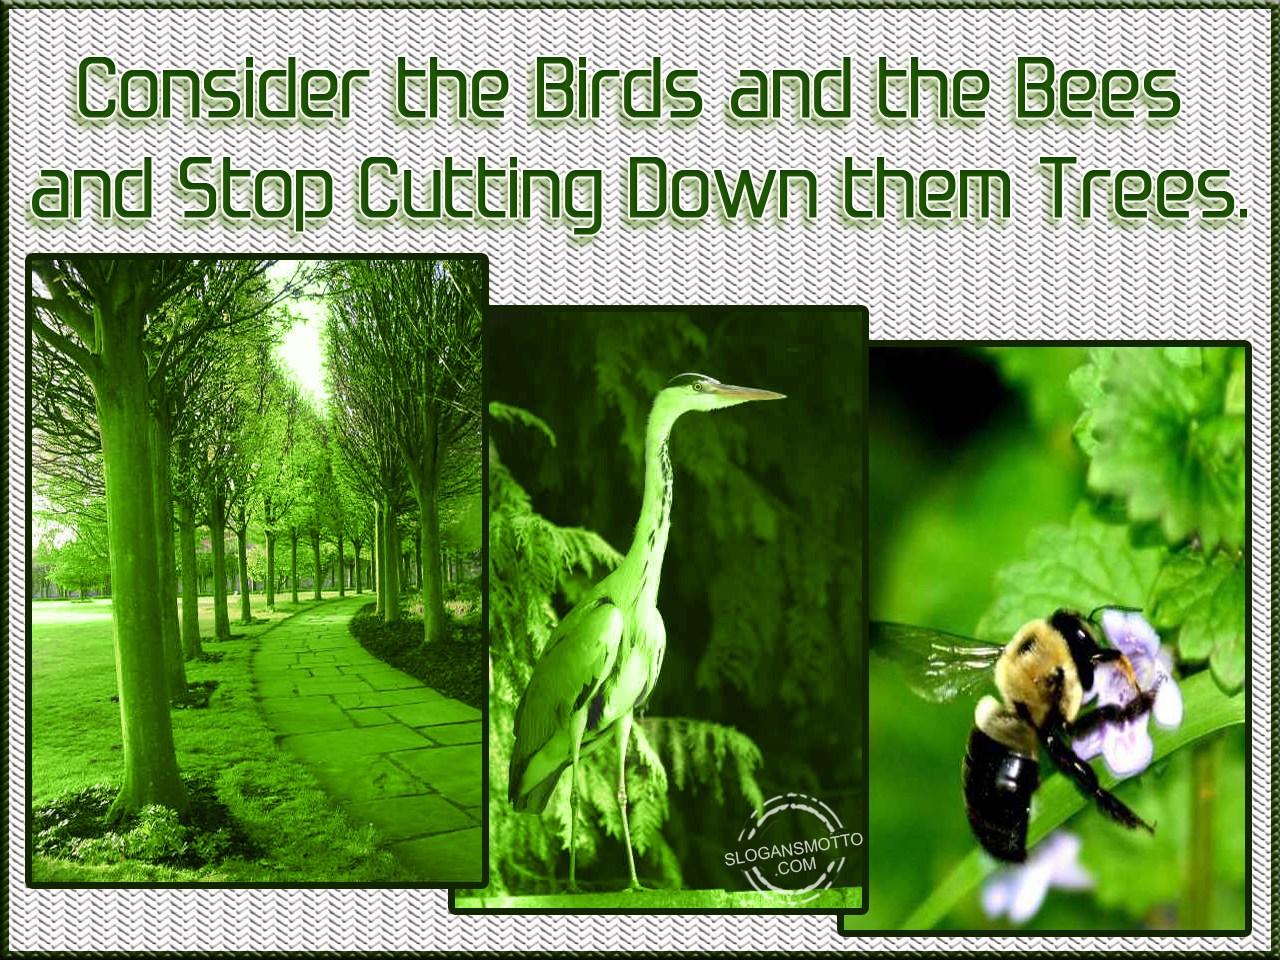 Slogans For Saving Birds